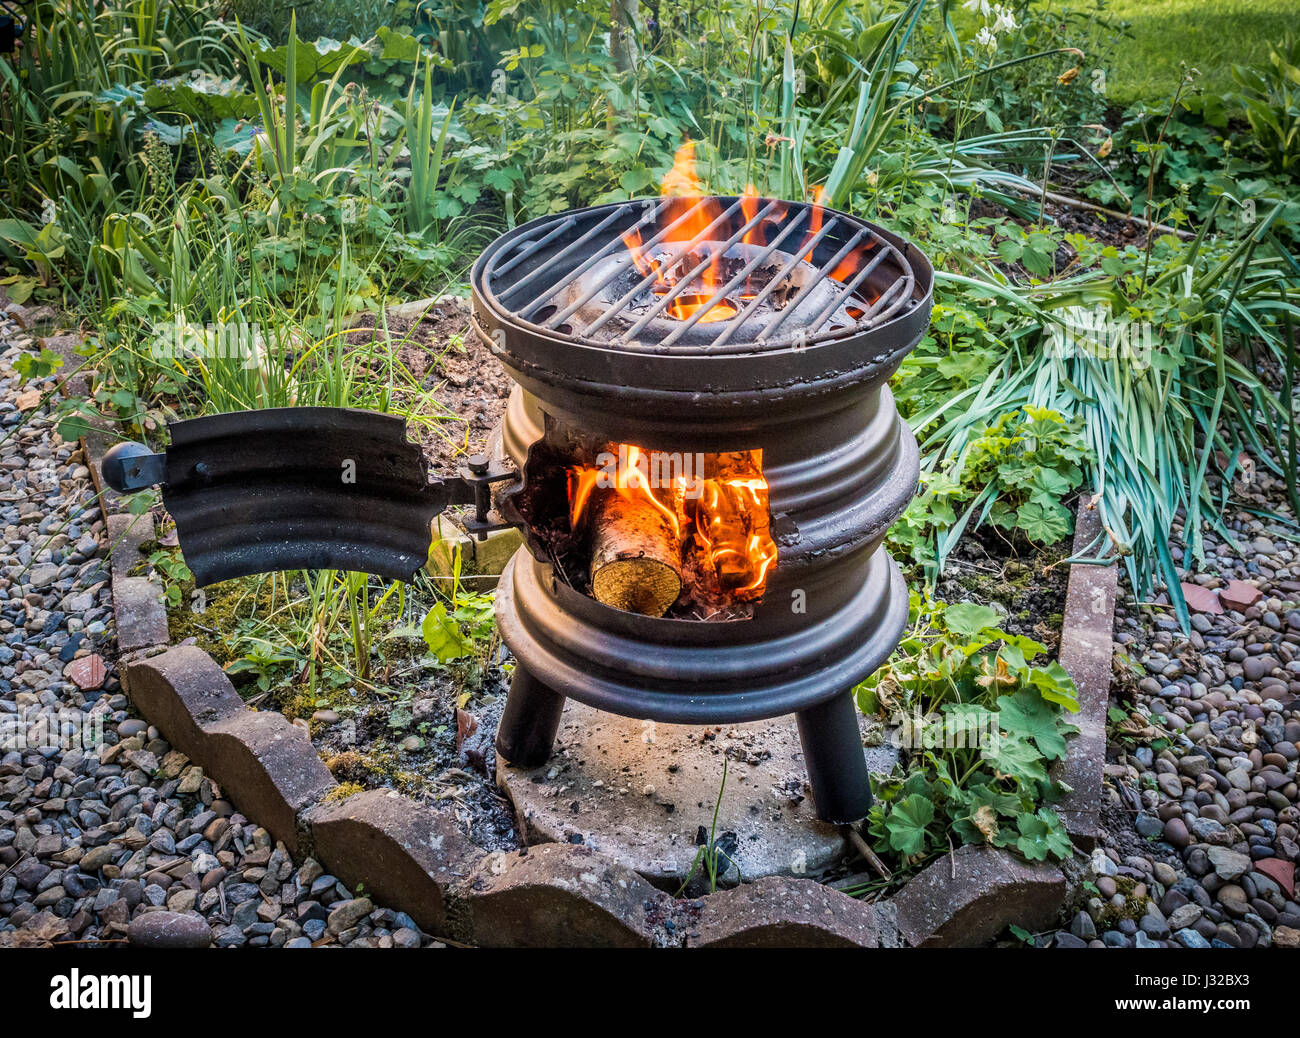 Upcycled car wheels turned into wood burning barbecue stove - Stock Image